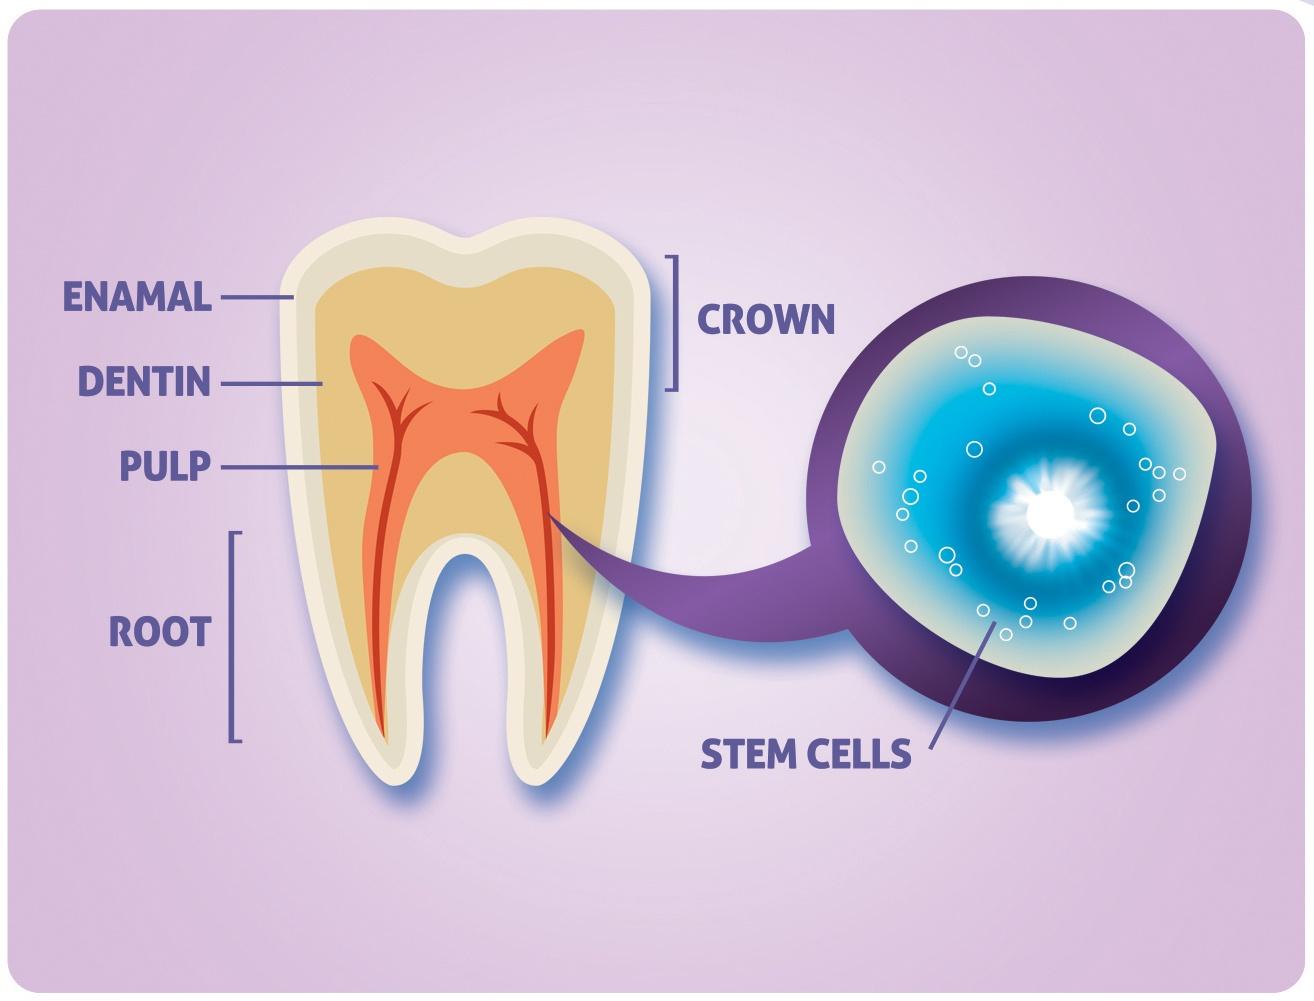 You are currently viewing کاشت دندان با سلول های بنیادی بهترین جایگزین دندان از دست رفته